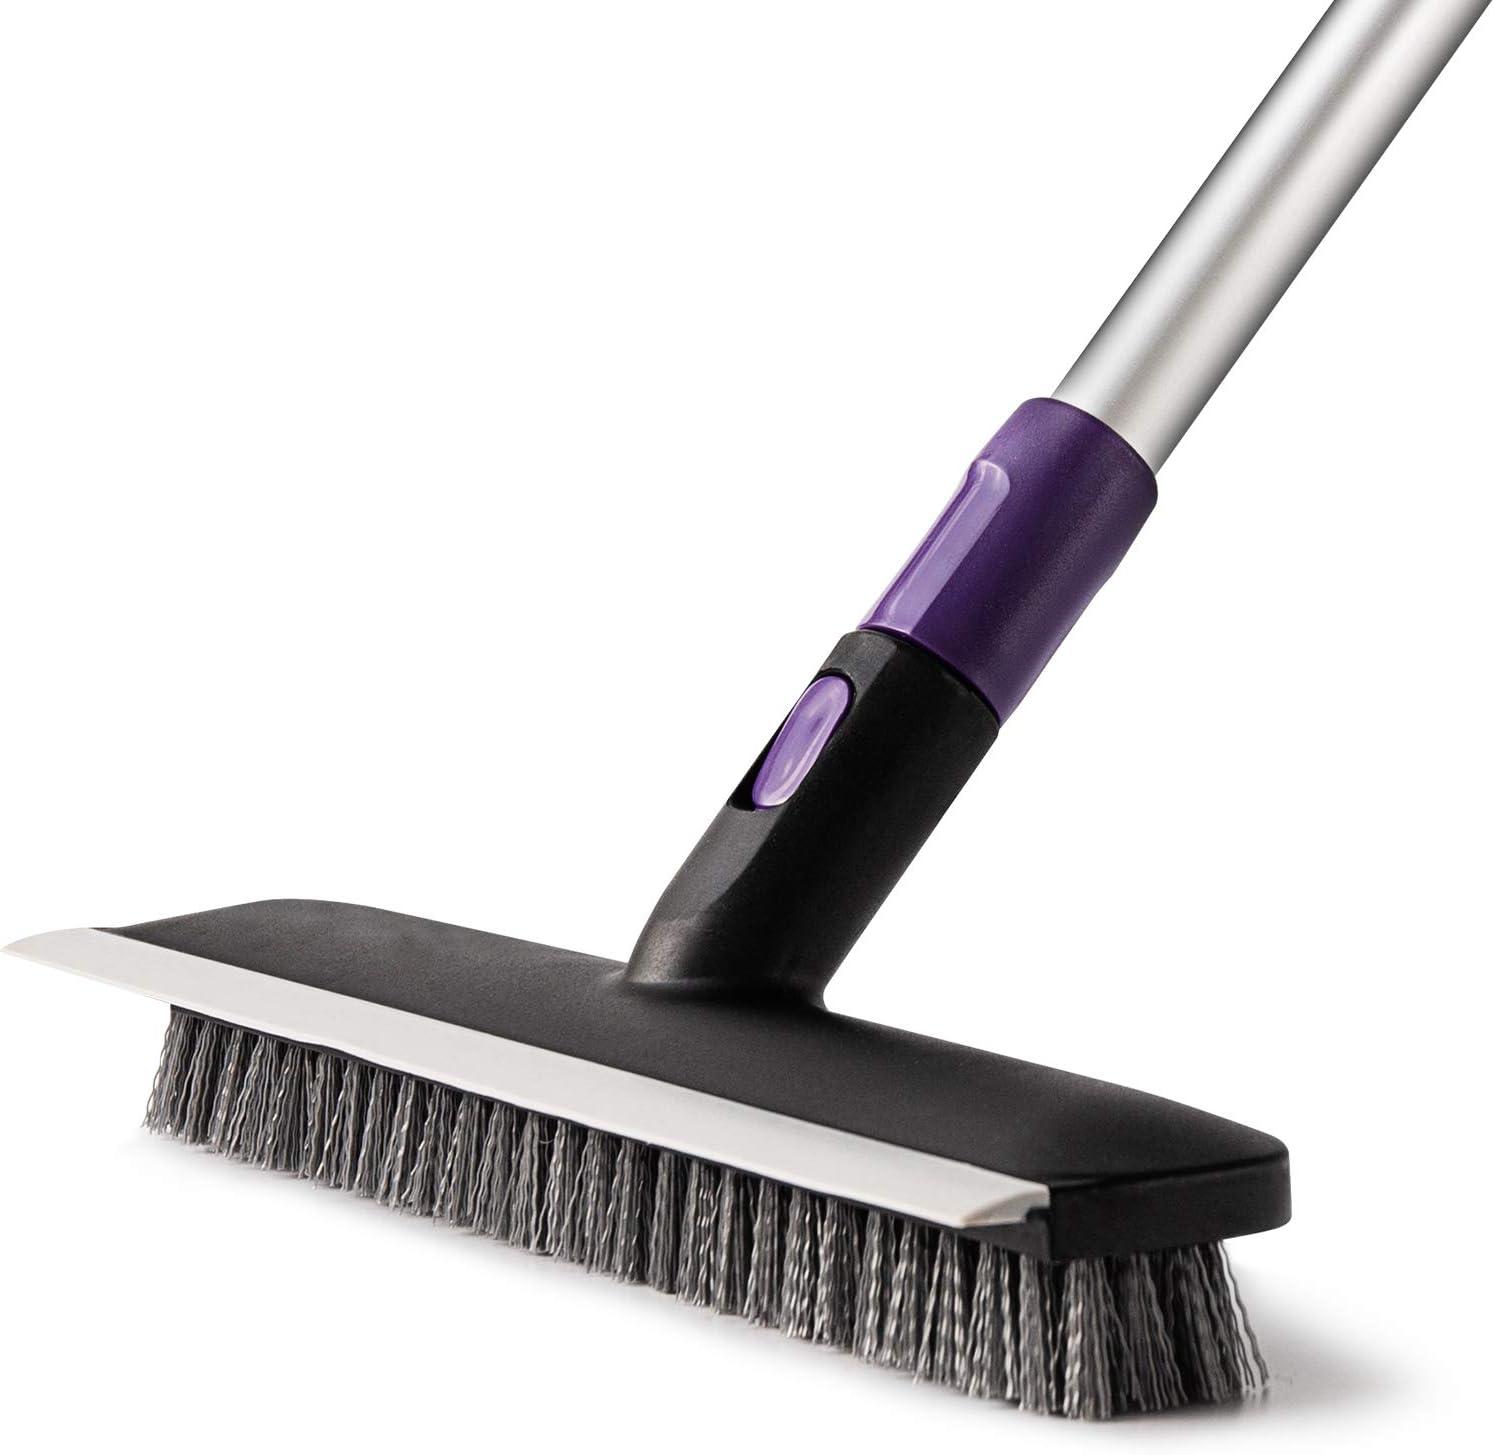 AKOMA Floor Scrub Brush with Extendable Long Handle 9